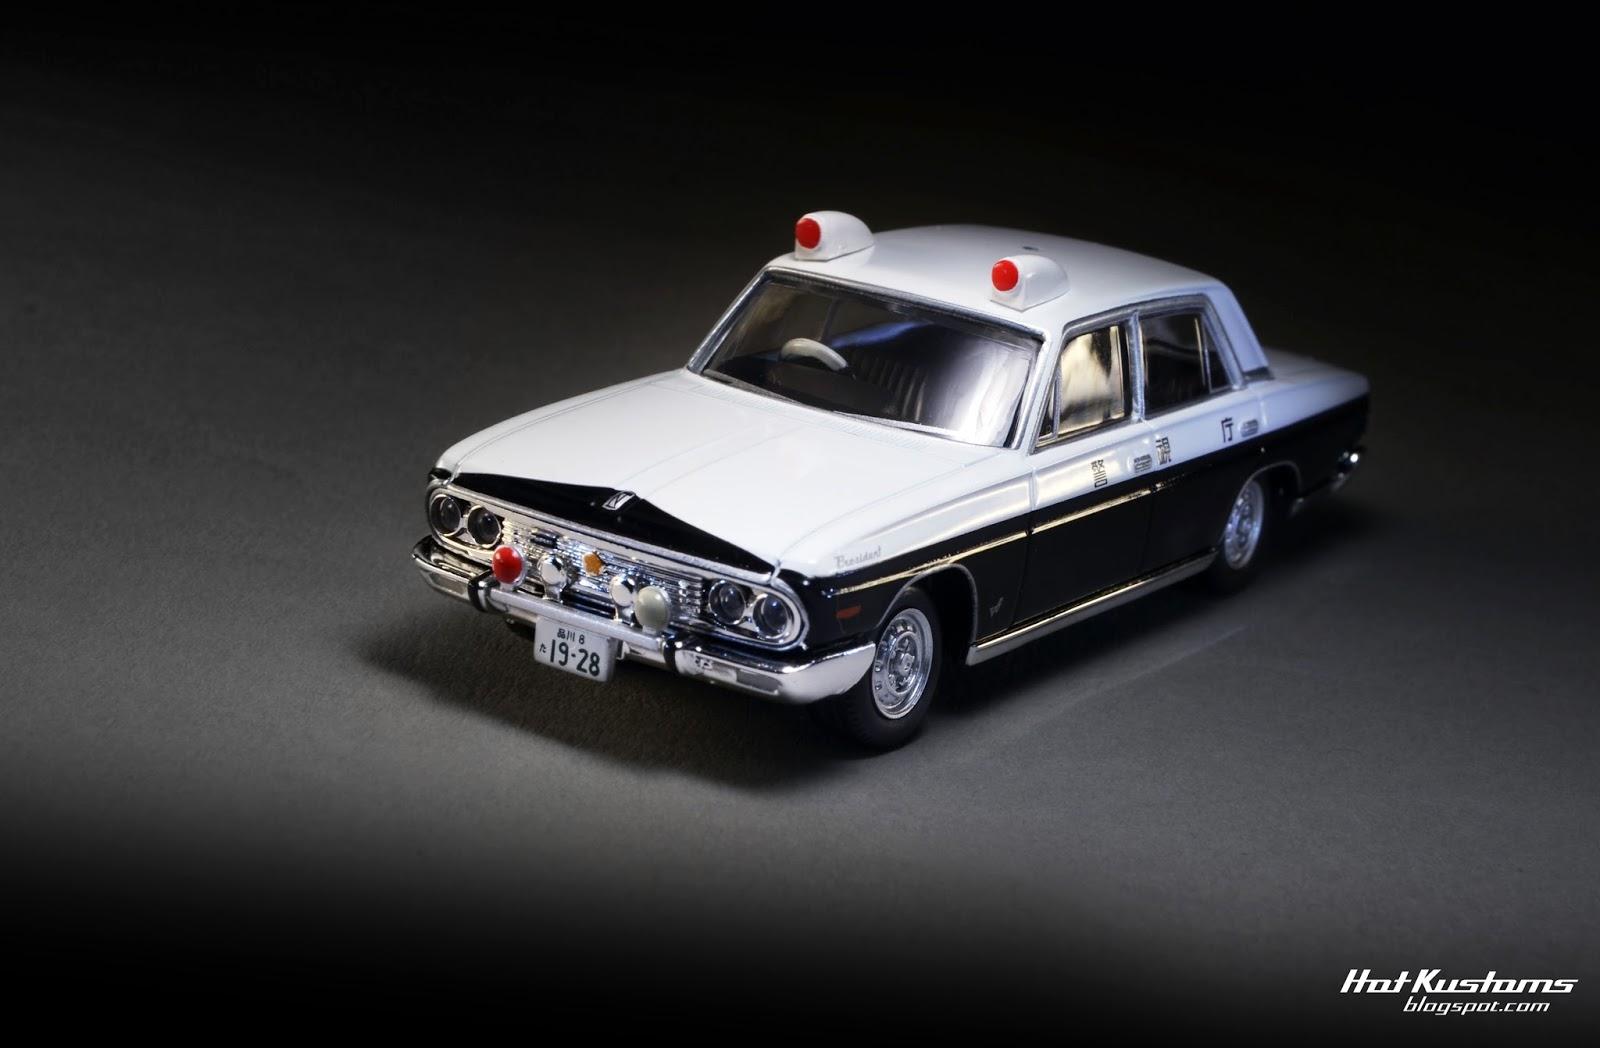 hot kustoms mini cars tlv nissan president patrol car. Black Bedroom Furniture Sets. Home Design Ideas